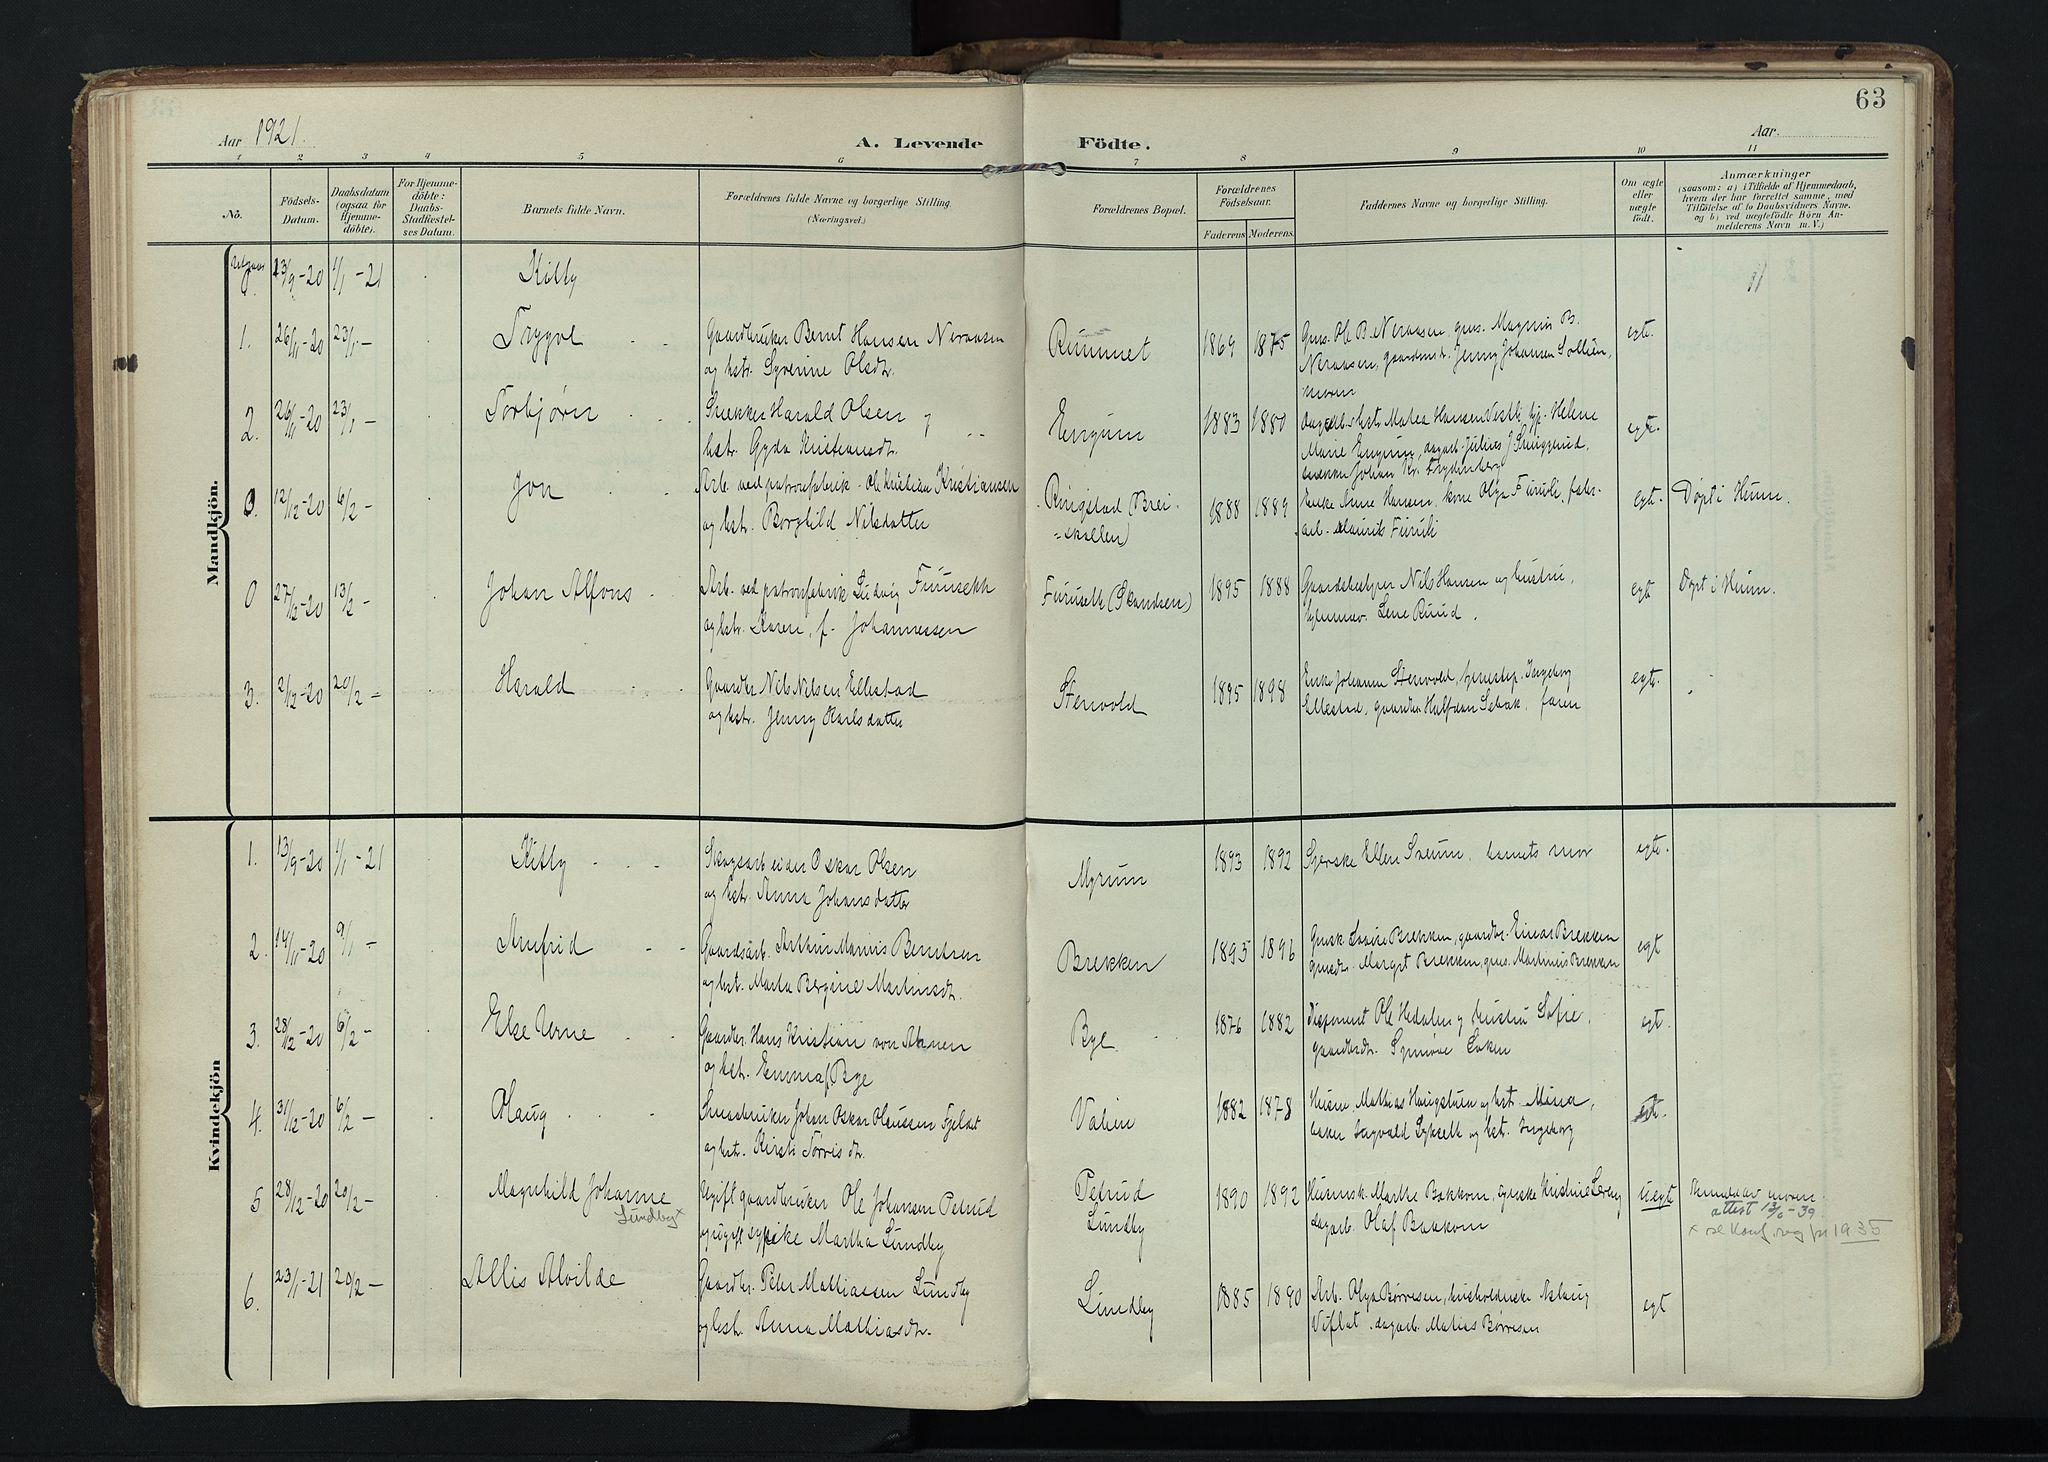 SAH, Vardal prestekontor, H/Ha/Haa/L0020: Ministerialbok nr. 20, 1907-1921, s. 63